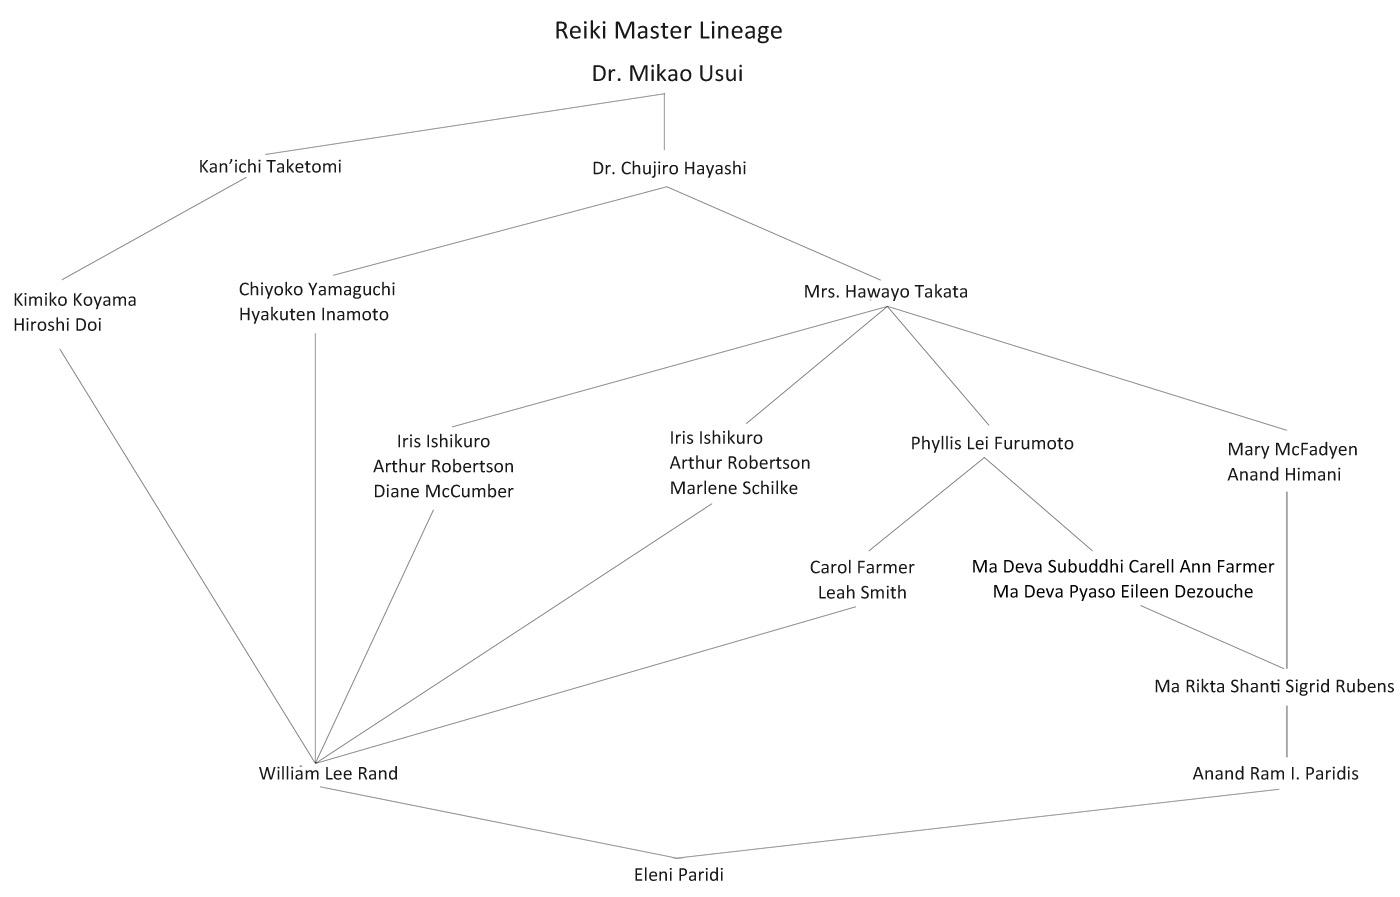 REIKI MASTER LINEAGE